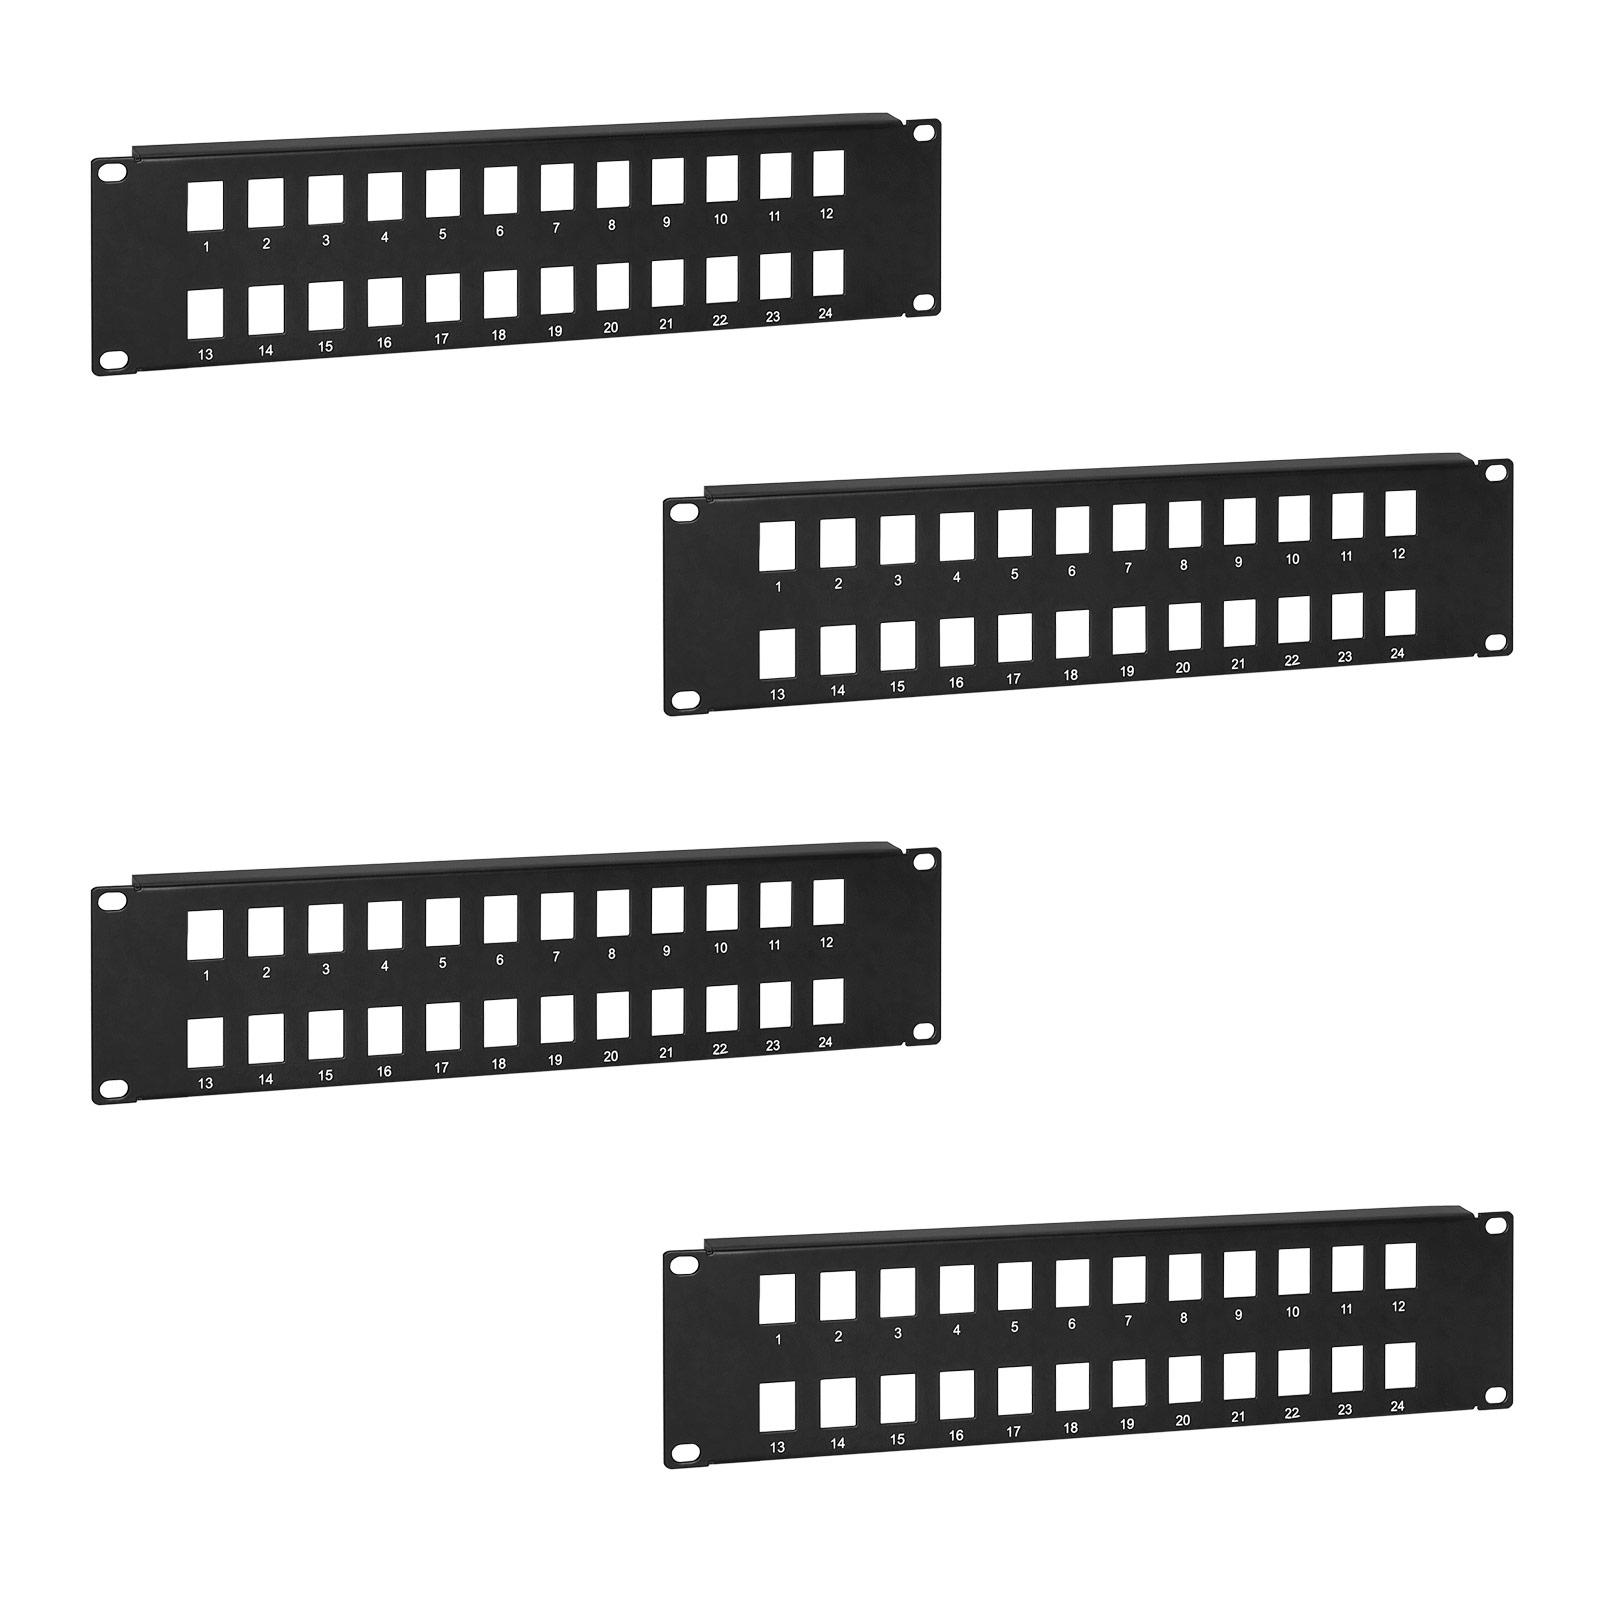 4x 24 Port 2u Keystone Jack Snap In Blank Patch Panel For